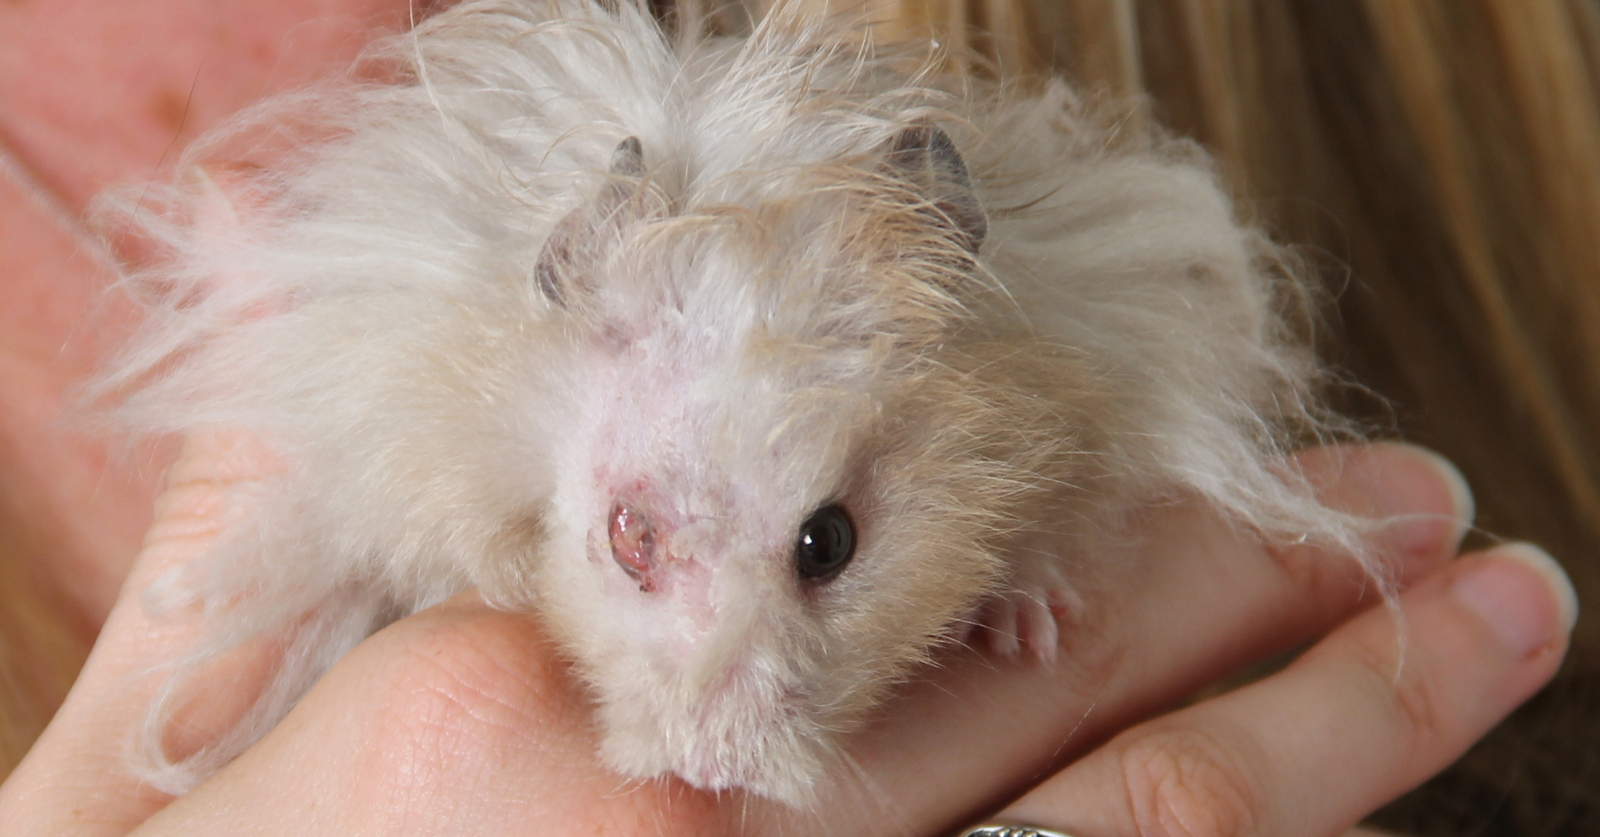 theo the hamster had a damaged eye